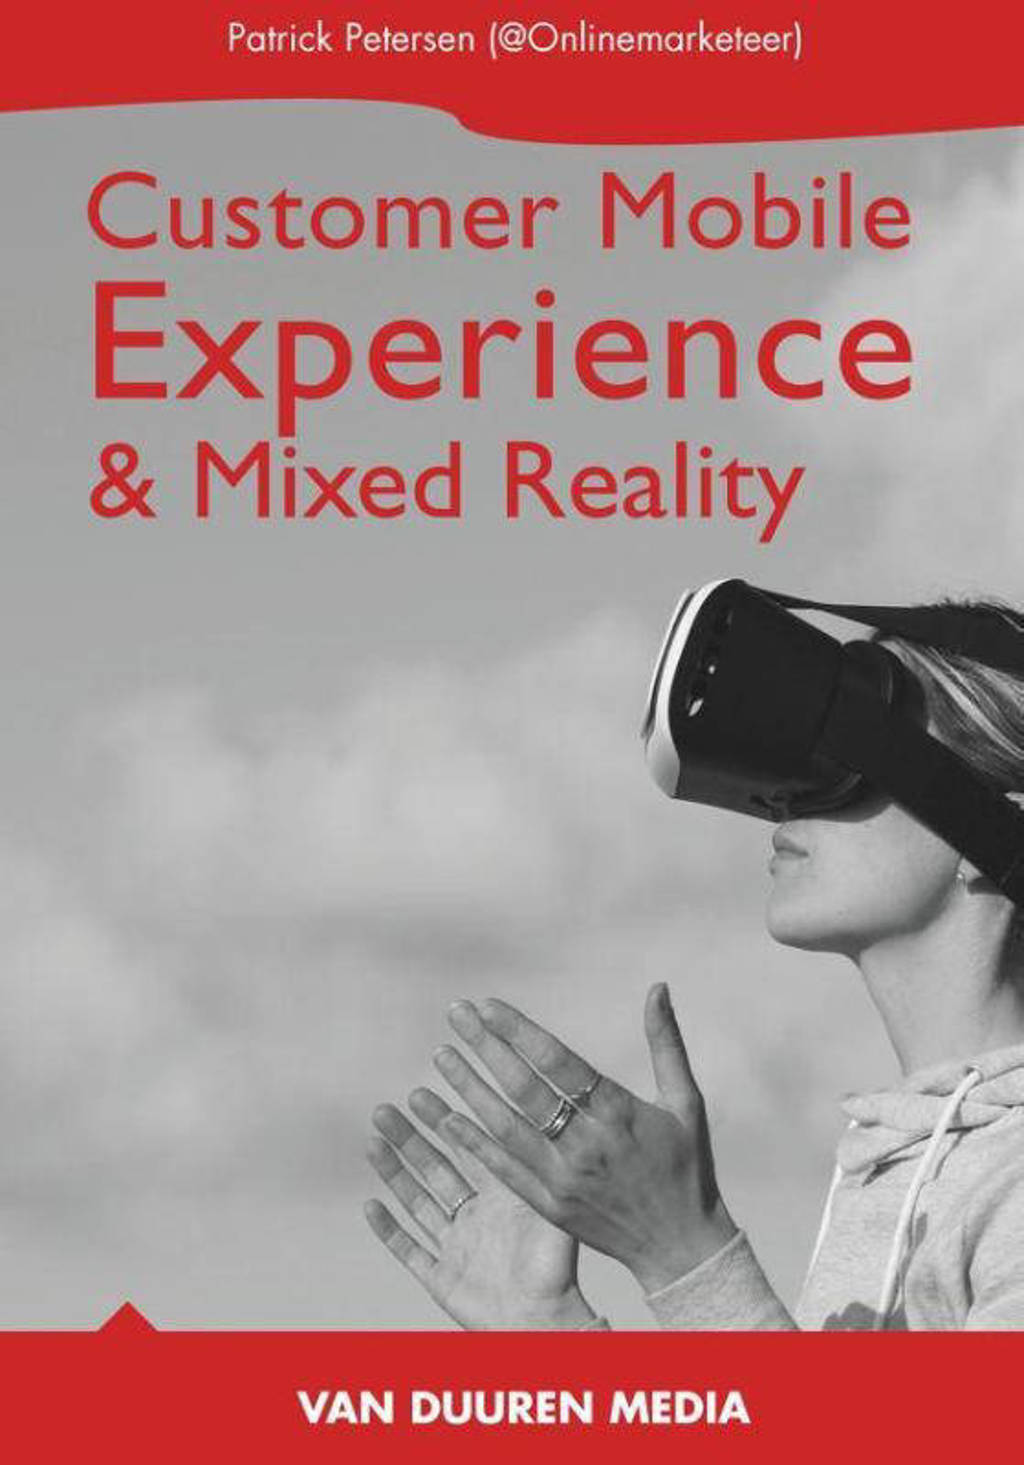 Handboek: Mobile Customer Experience & Mixed Reality - Patrick Petersen